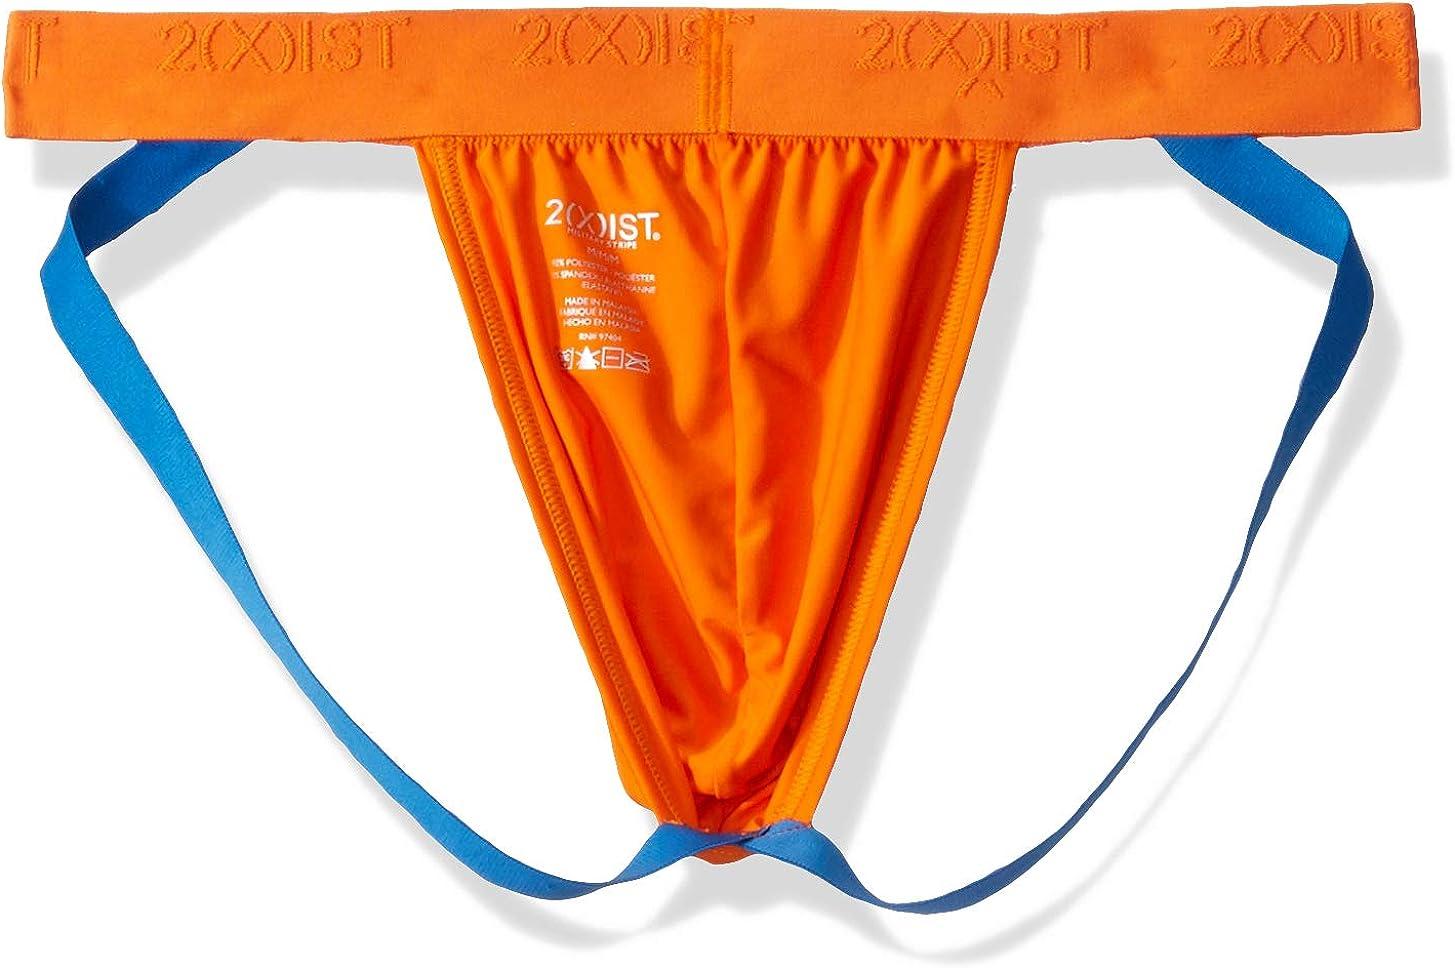 X 2 IST Mens Sliq Micro Thong Underwear